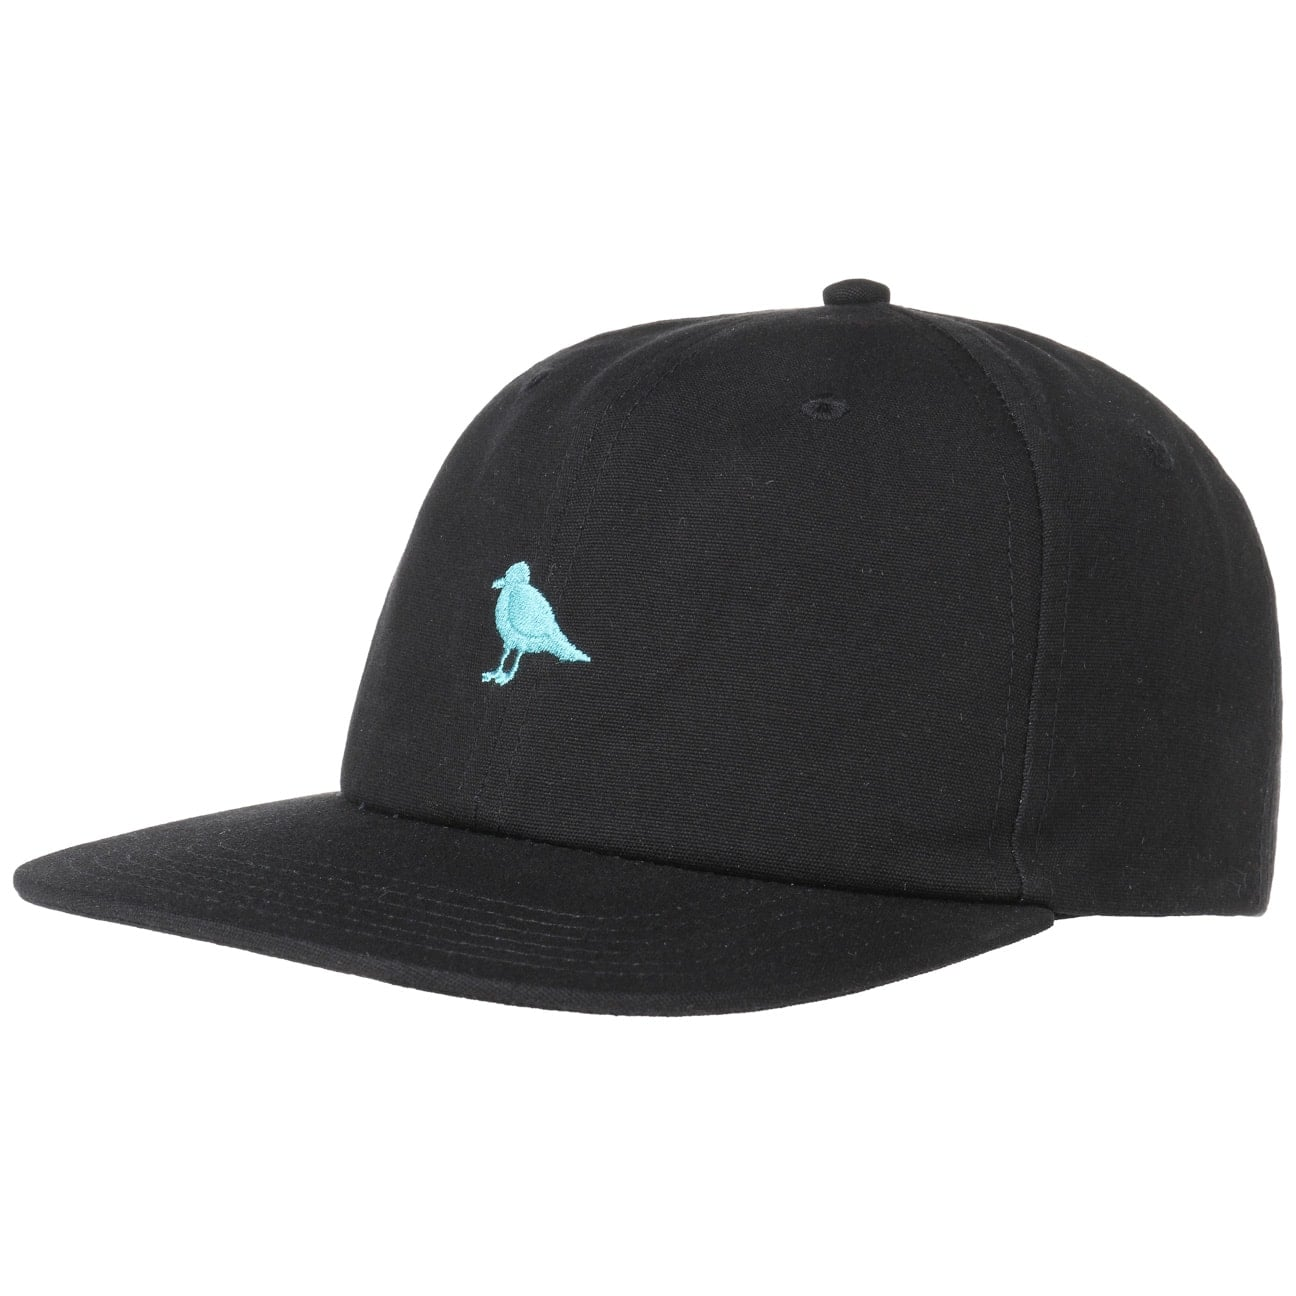 Gorra Mini Gull Strapback by Cleptomanicx  gorra de algod?n